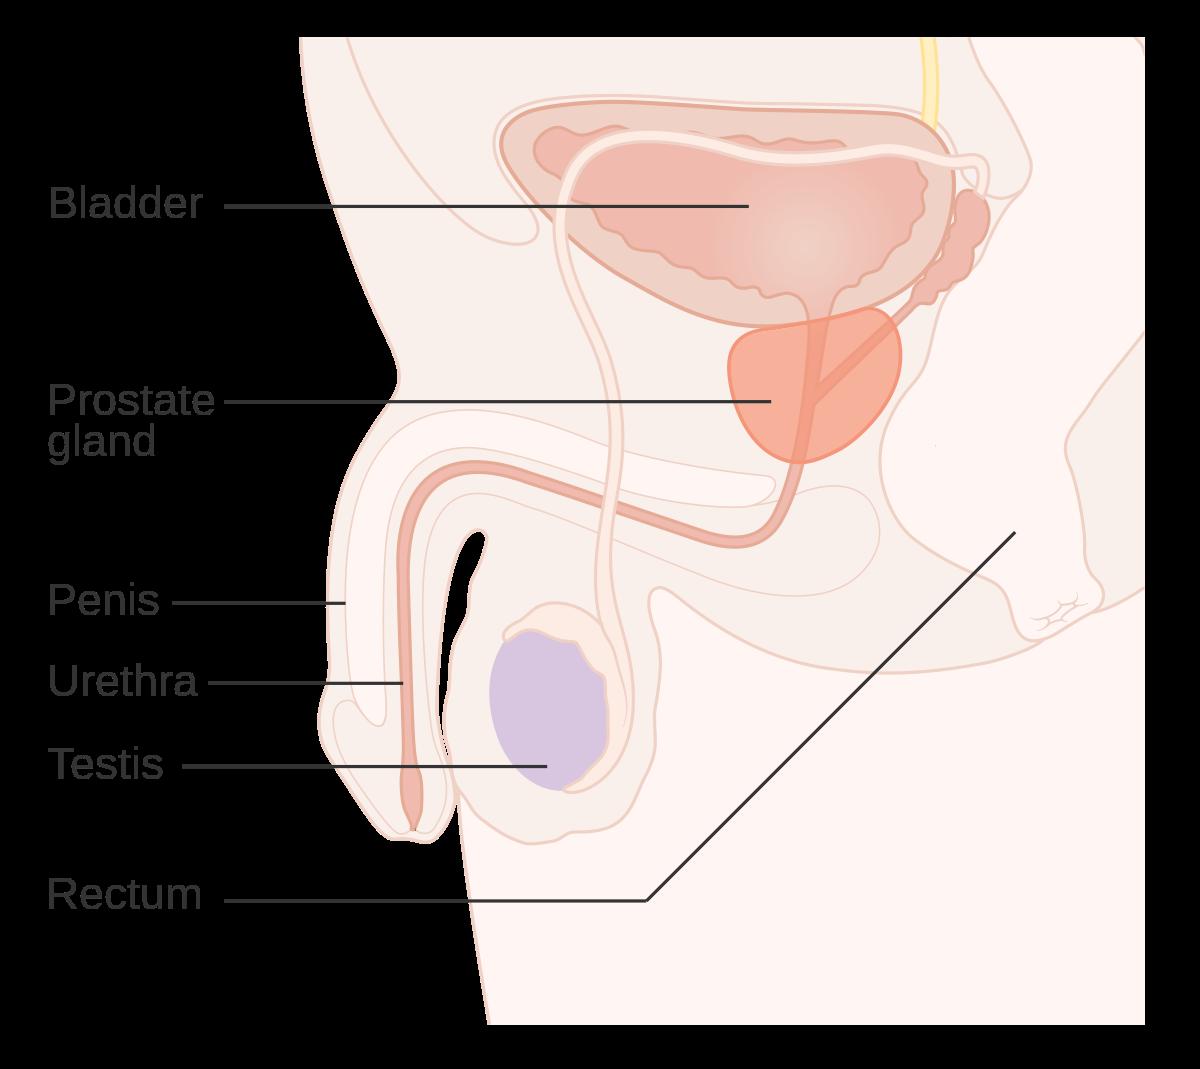 Hpv cancer prostate. Hpv cancer prostate